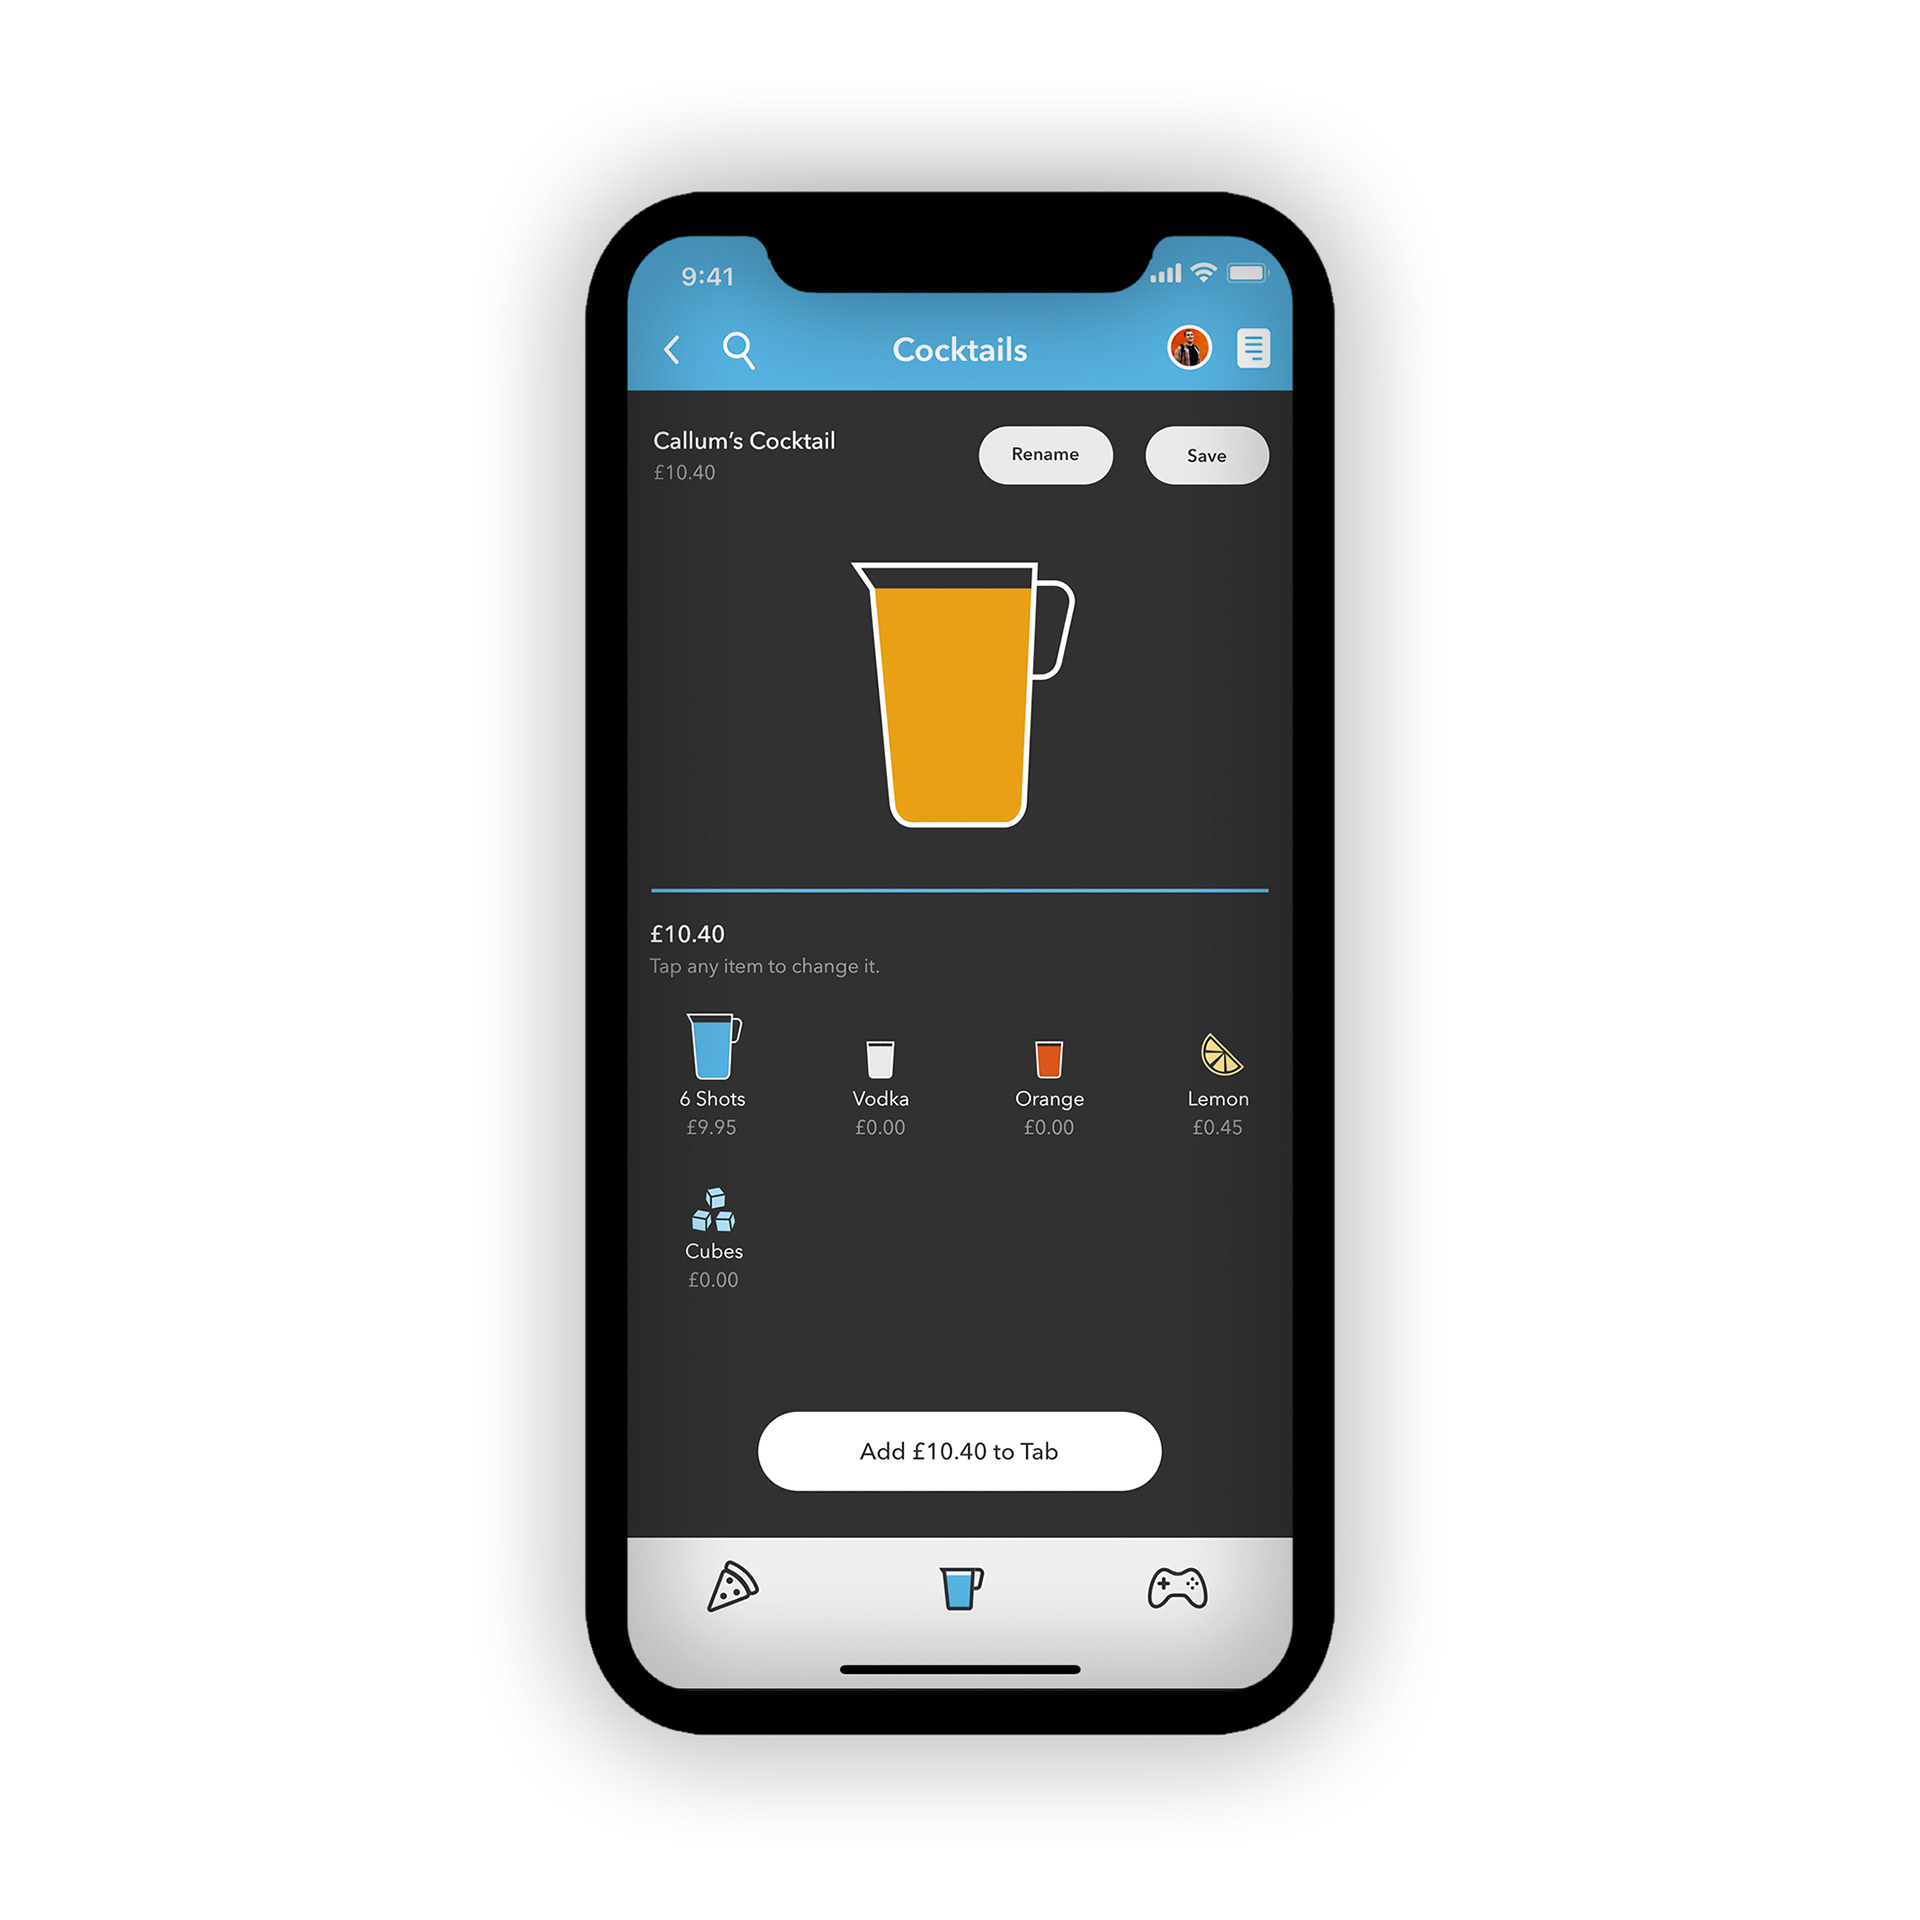 The Hub - Drinks